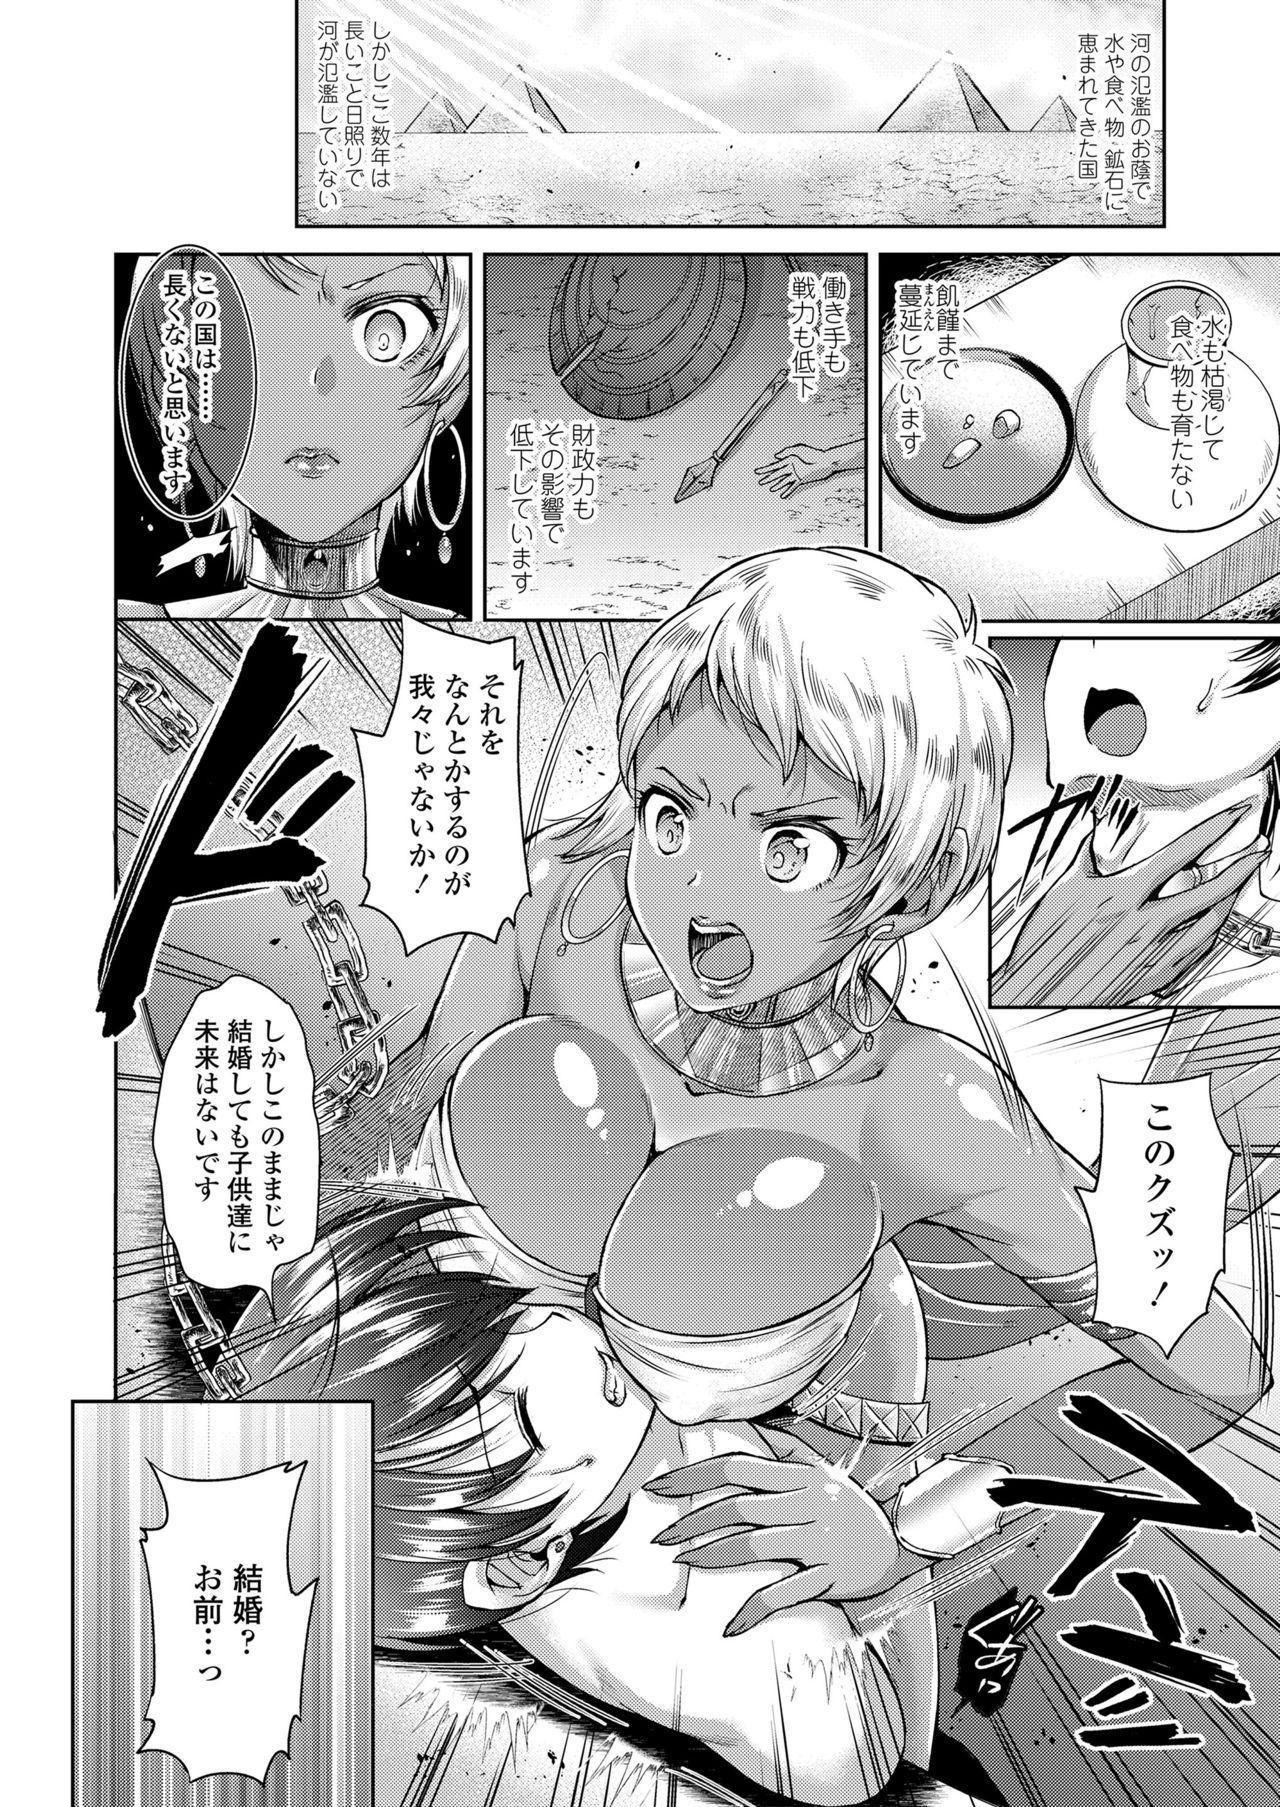 Girls forM Vol.19 251